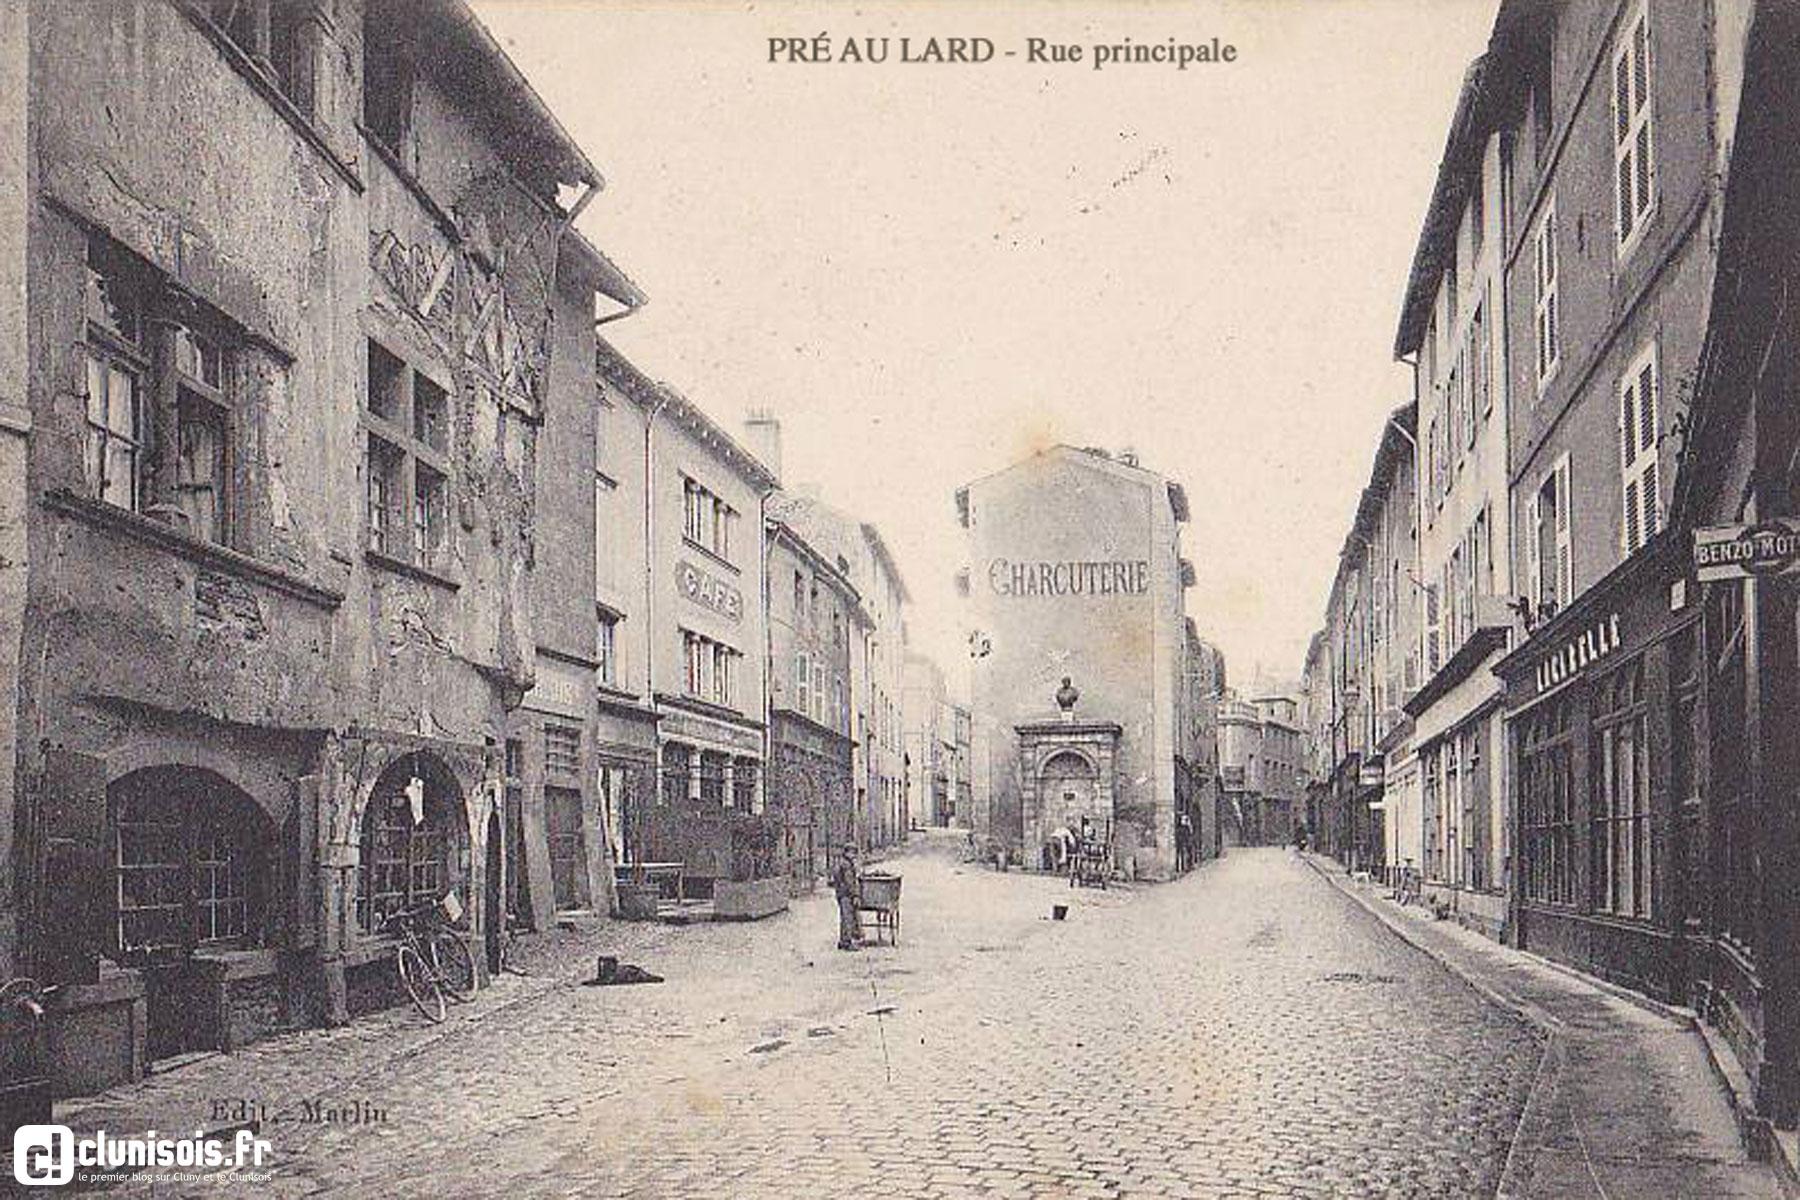 15-poudlard-existe-rue-pre-au-lard-clunisoisfr